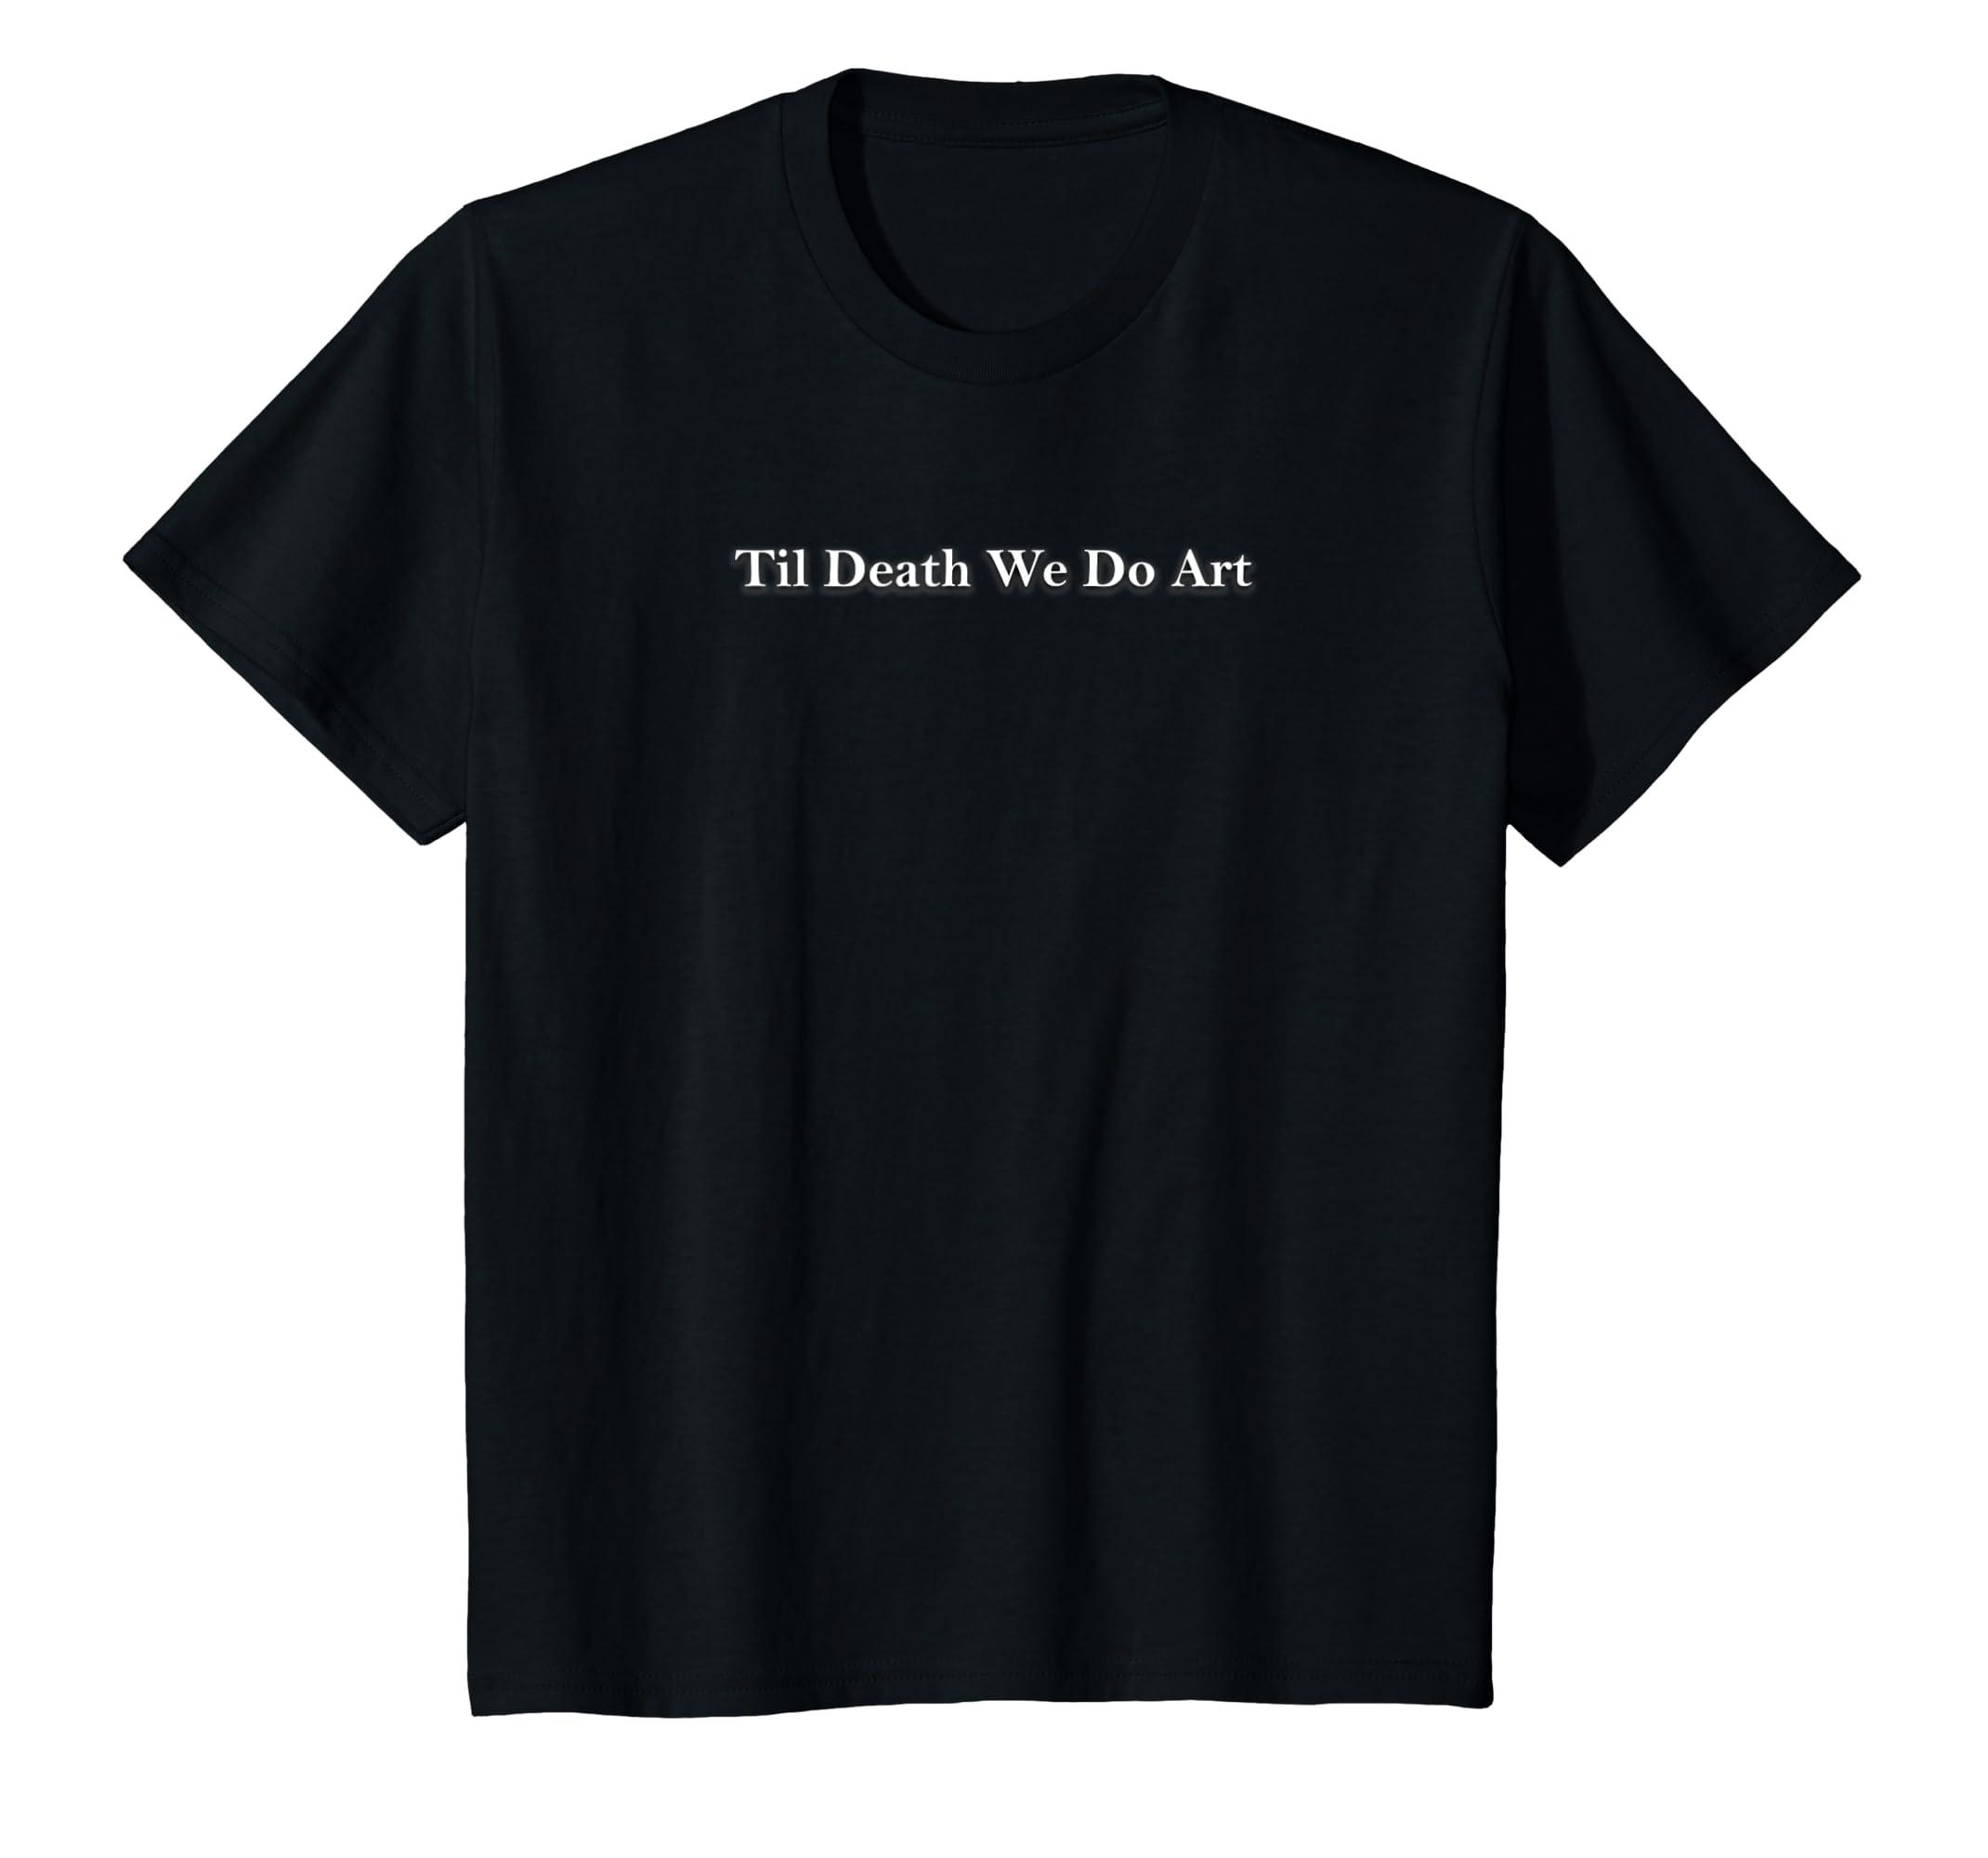 db07b2bd16 Amazon.com: Til Death We Do Art Funny Art is Life Artists T Shirt: Clothing